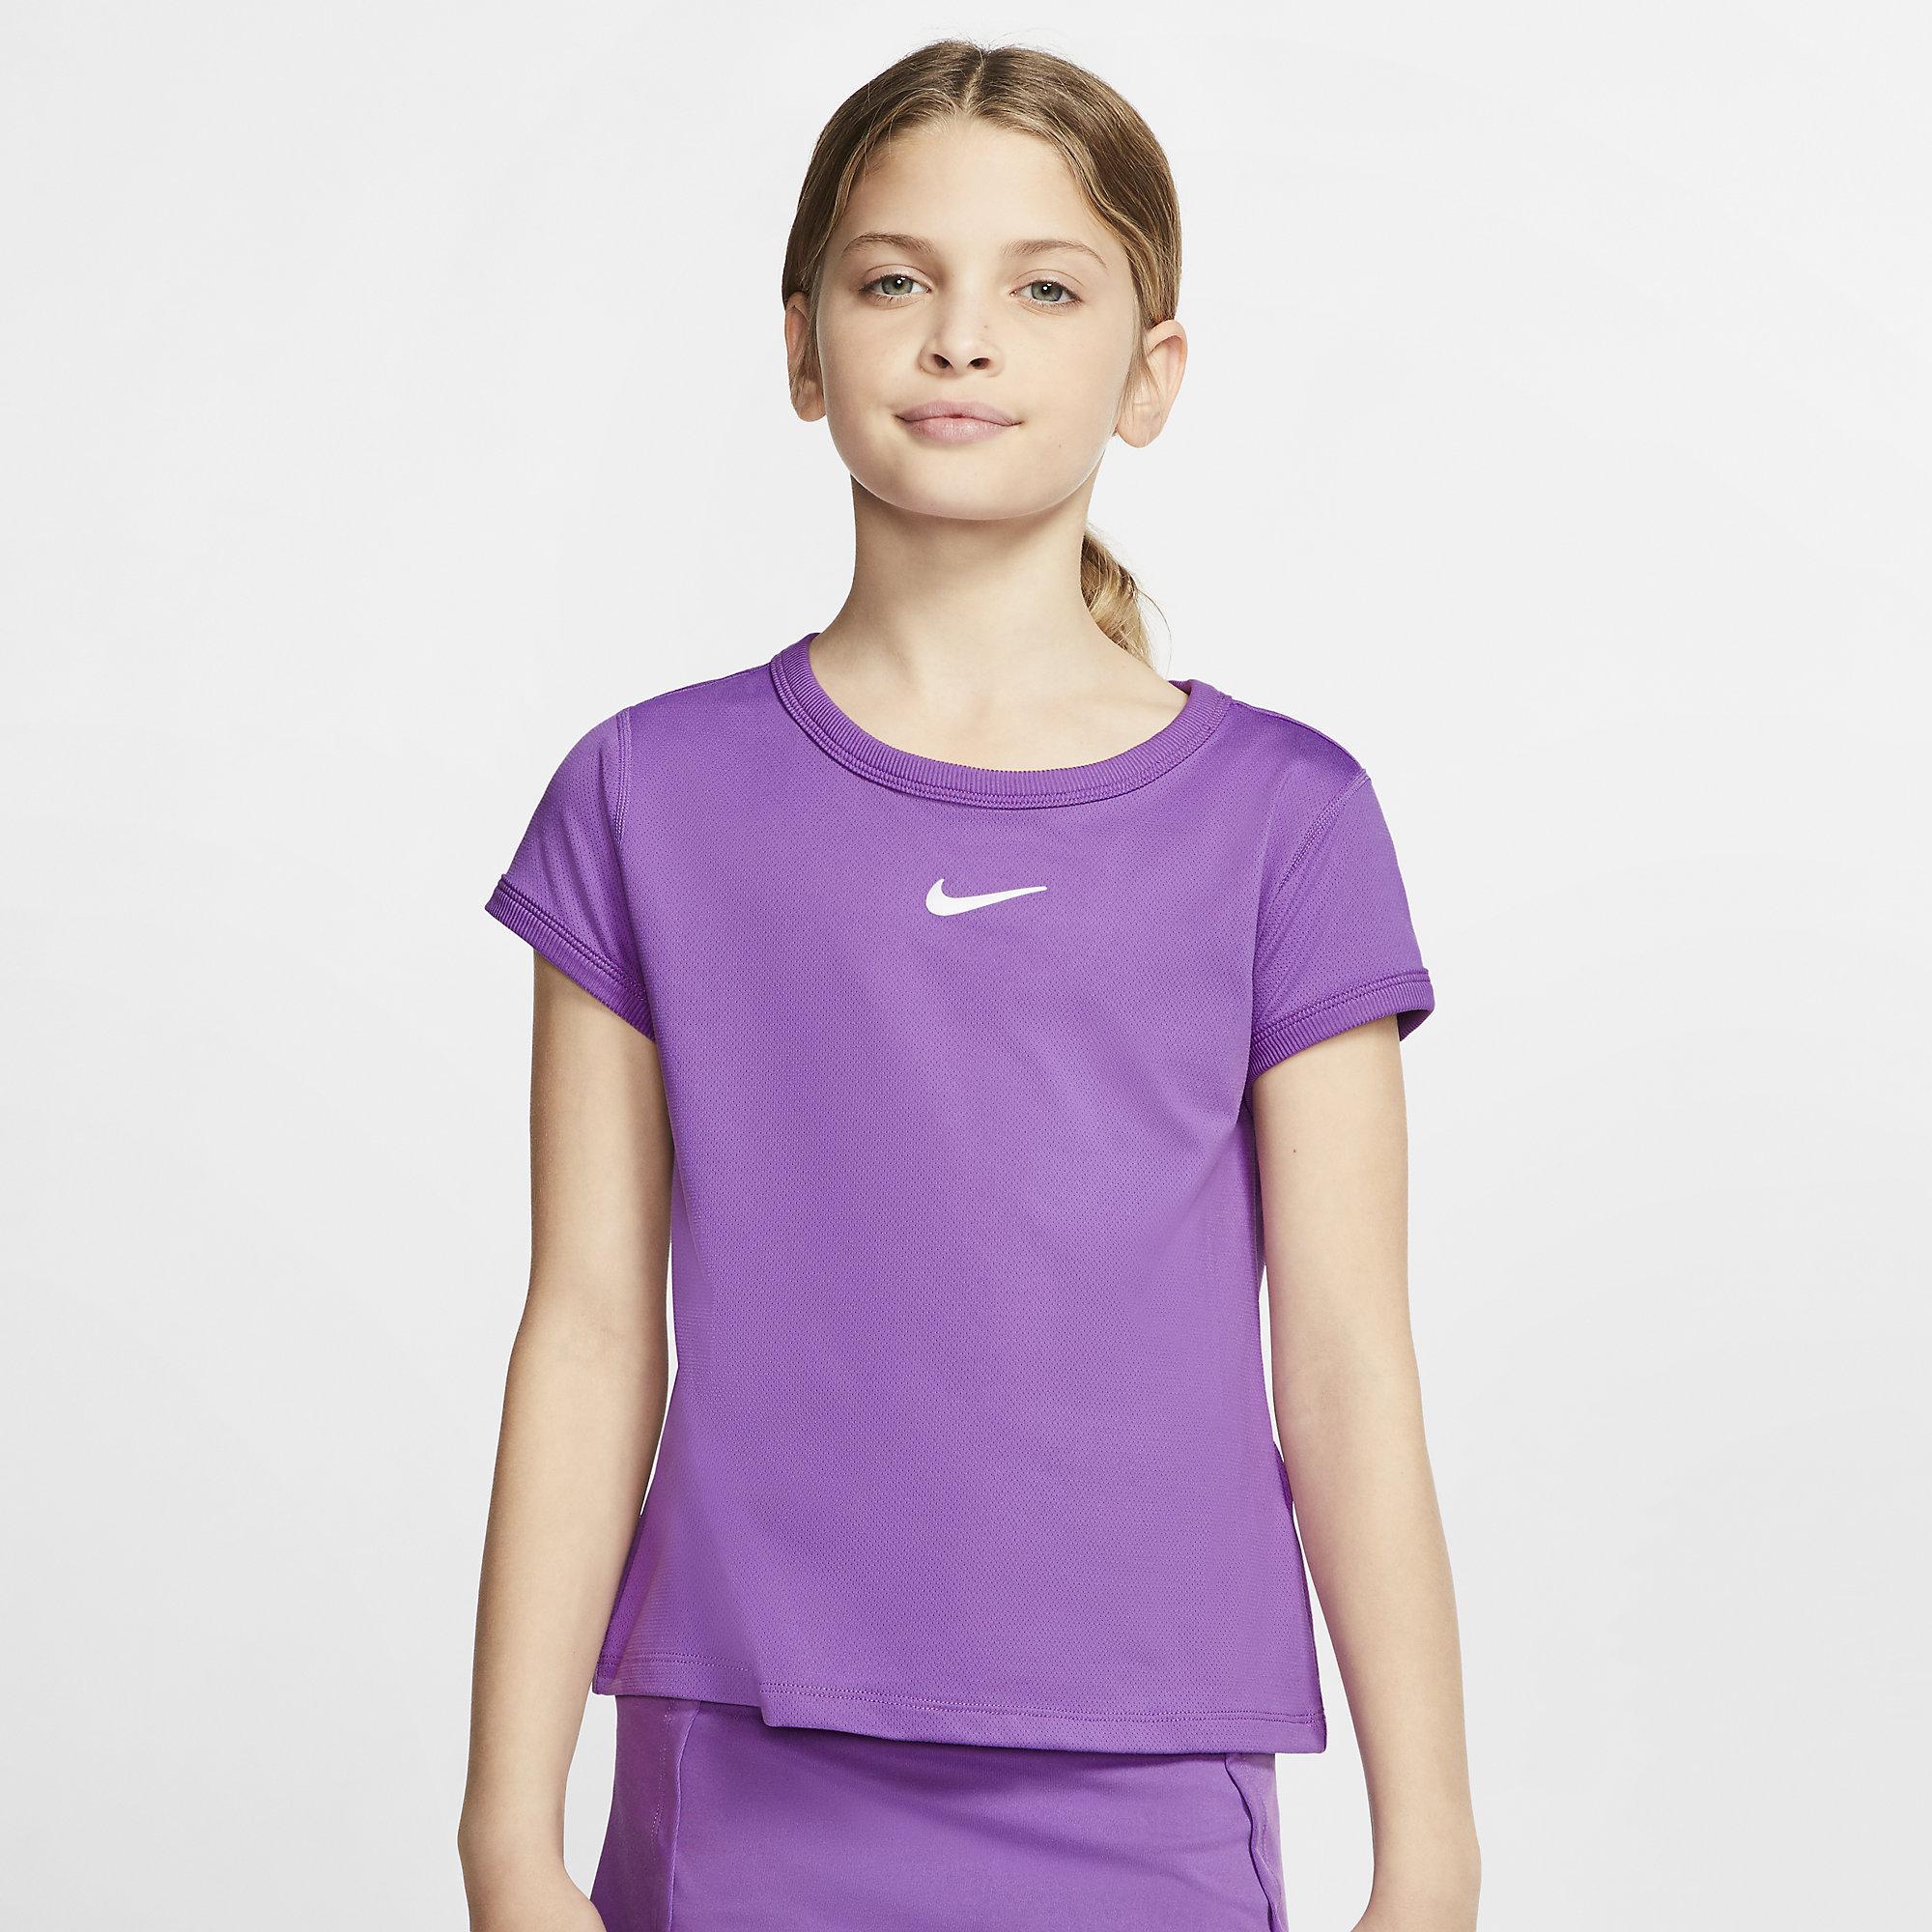 Nike Girls Dri-FIT Top - Purple Nebula